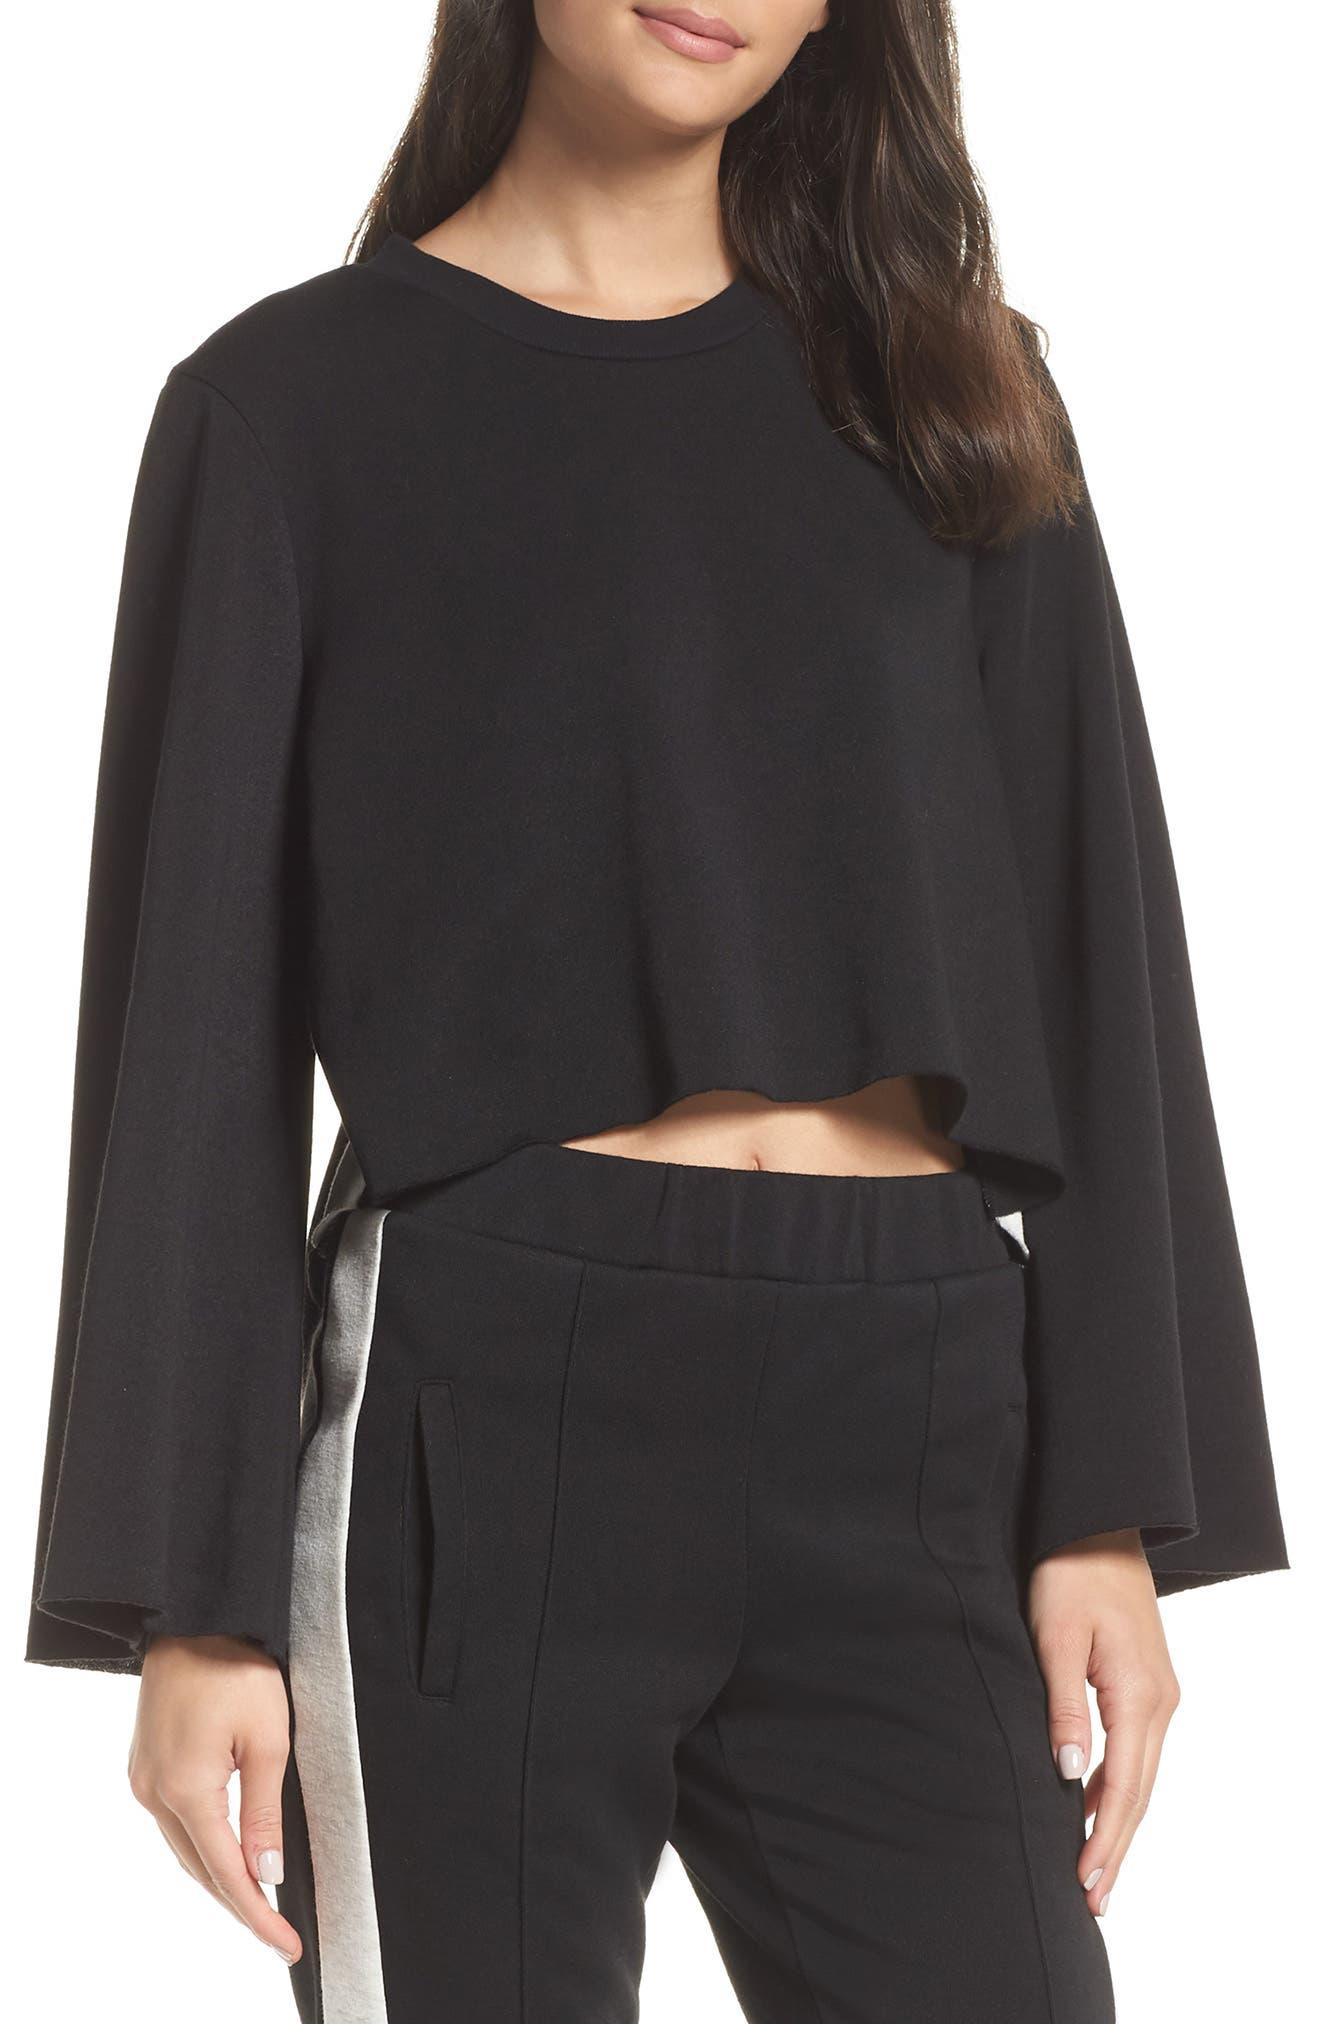 Chalmers Farrah Lounge Sweatshirt